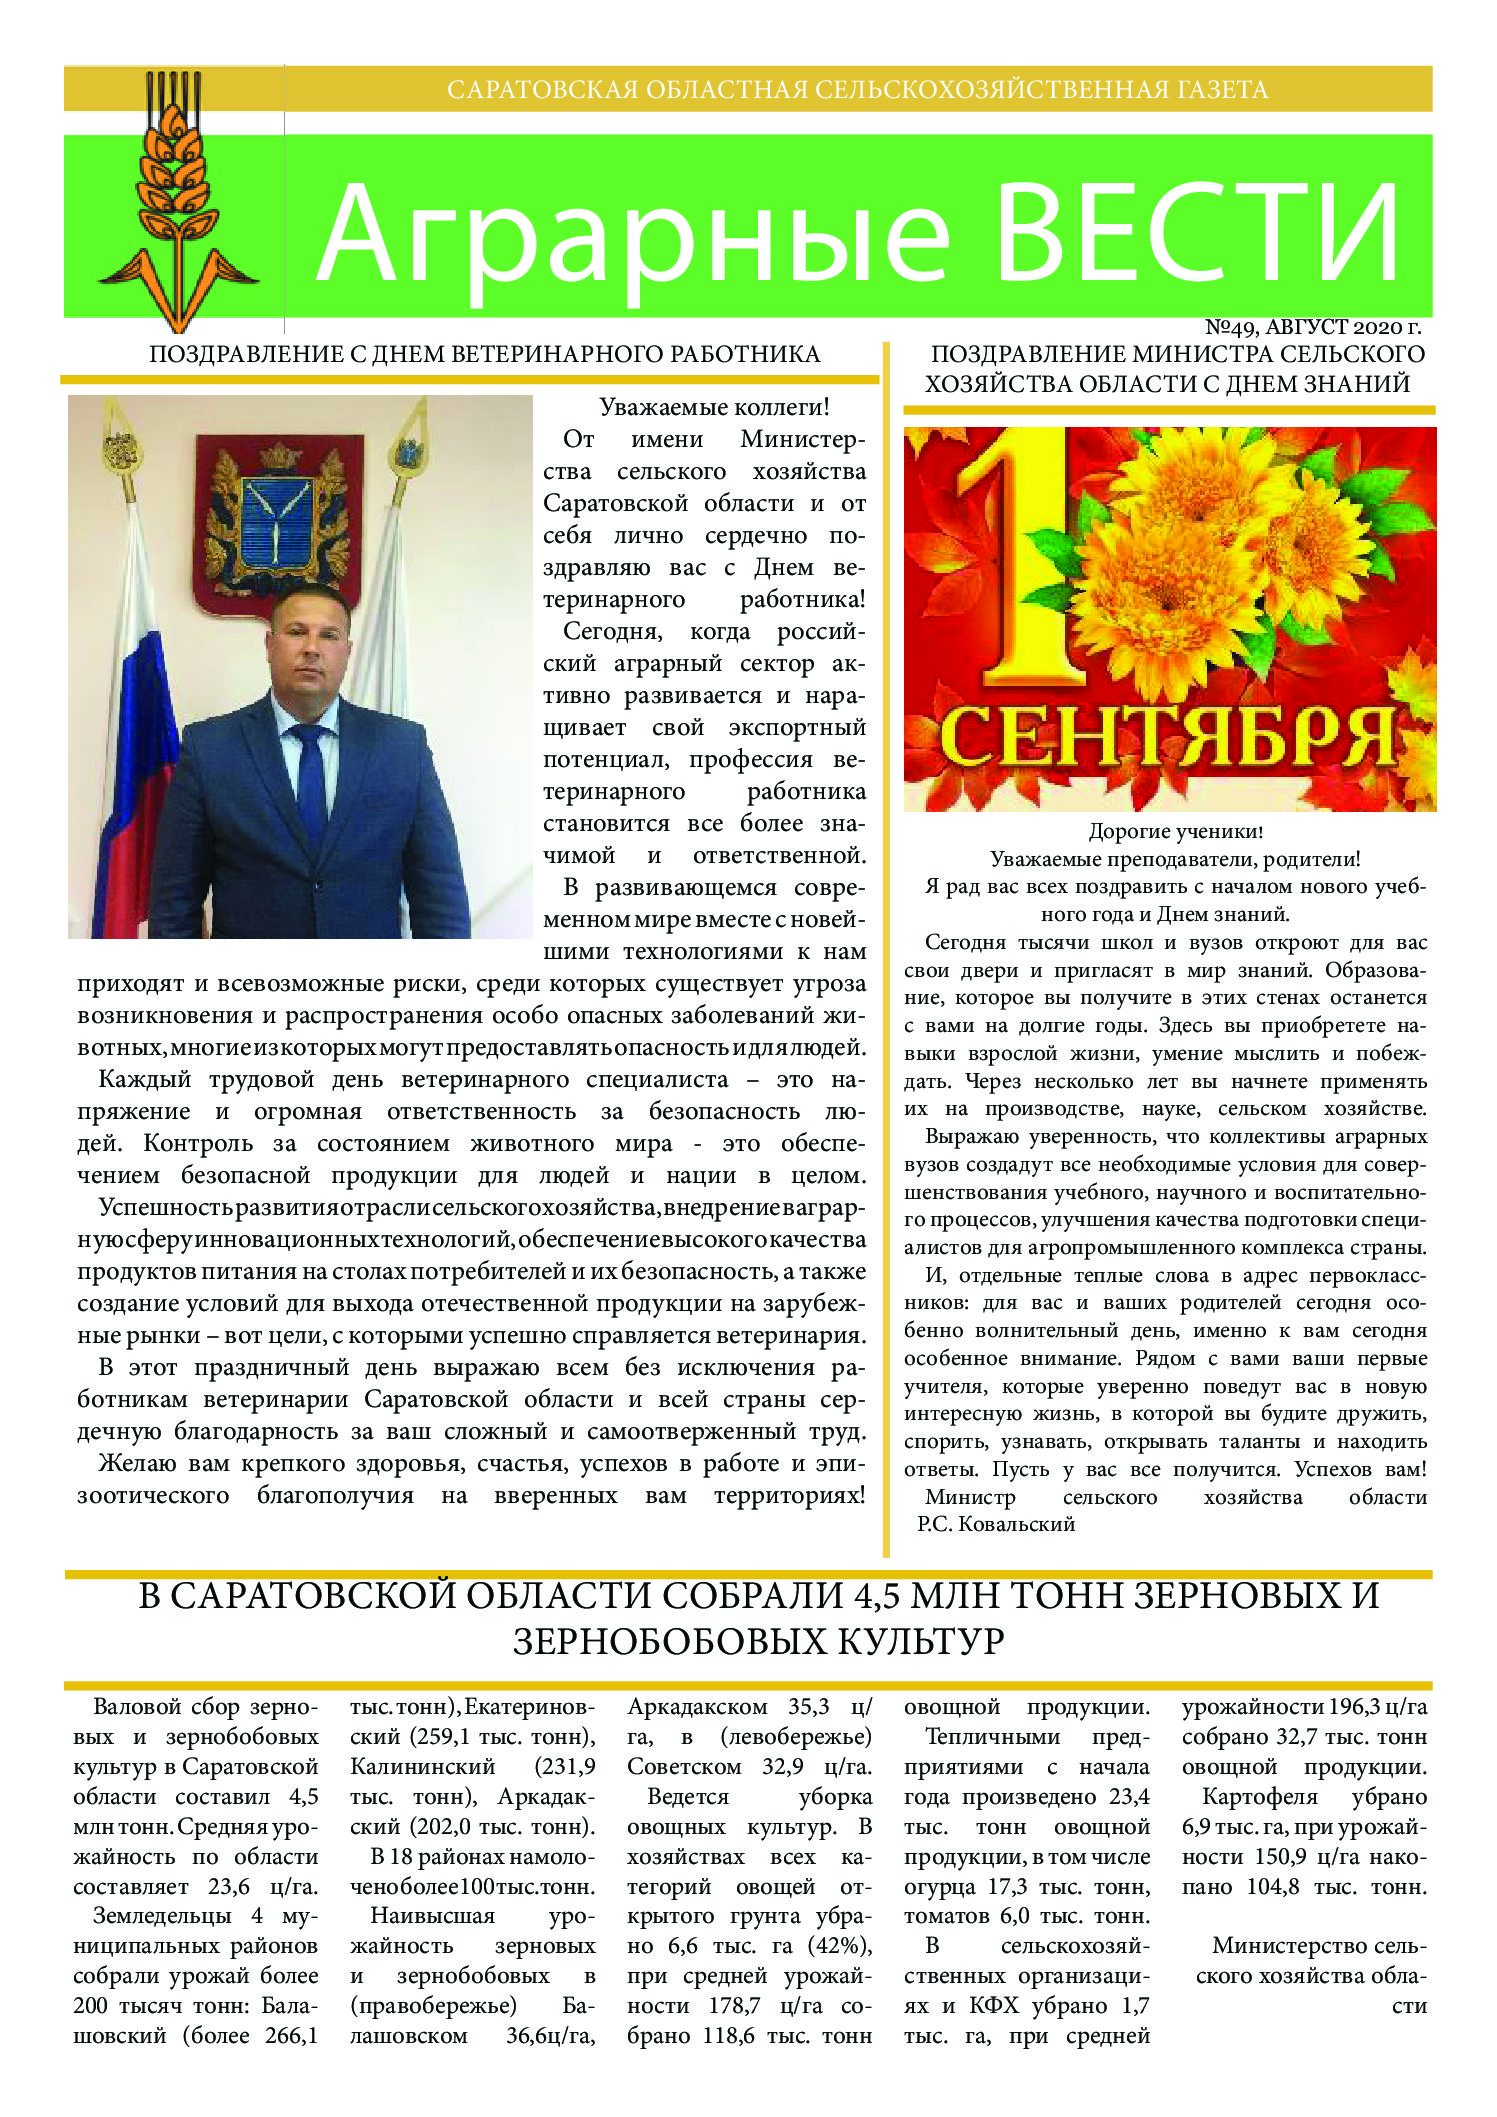 https://saratovagro.ru/wp-content/uploads/2020/09/Август49-pdf.jpg